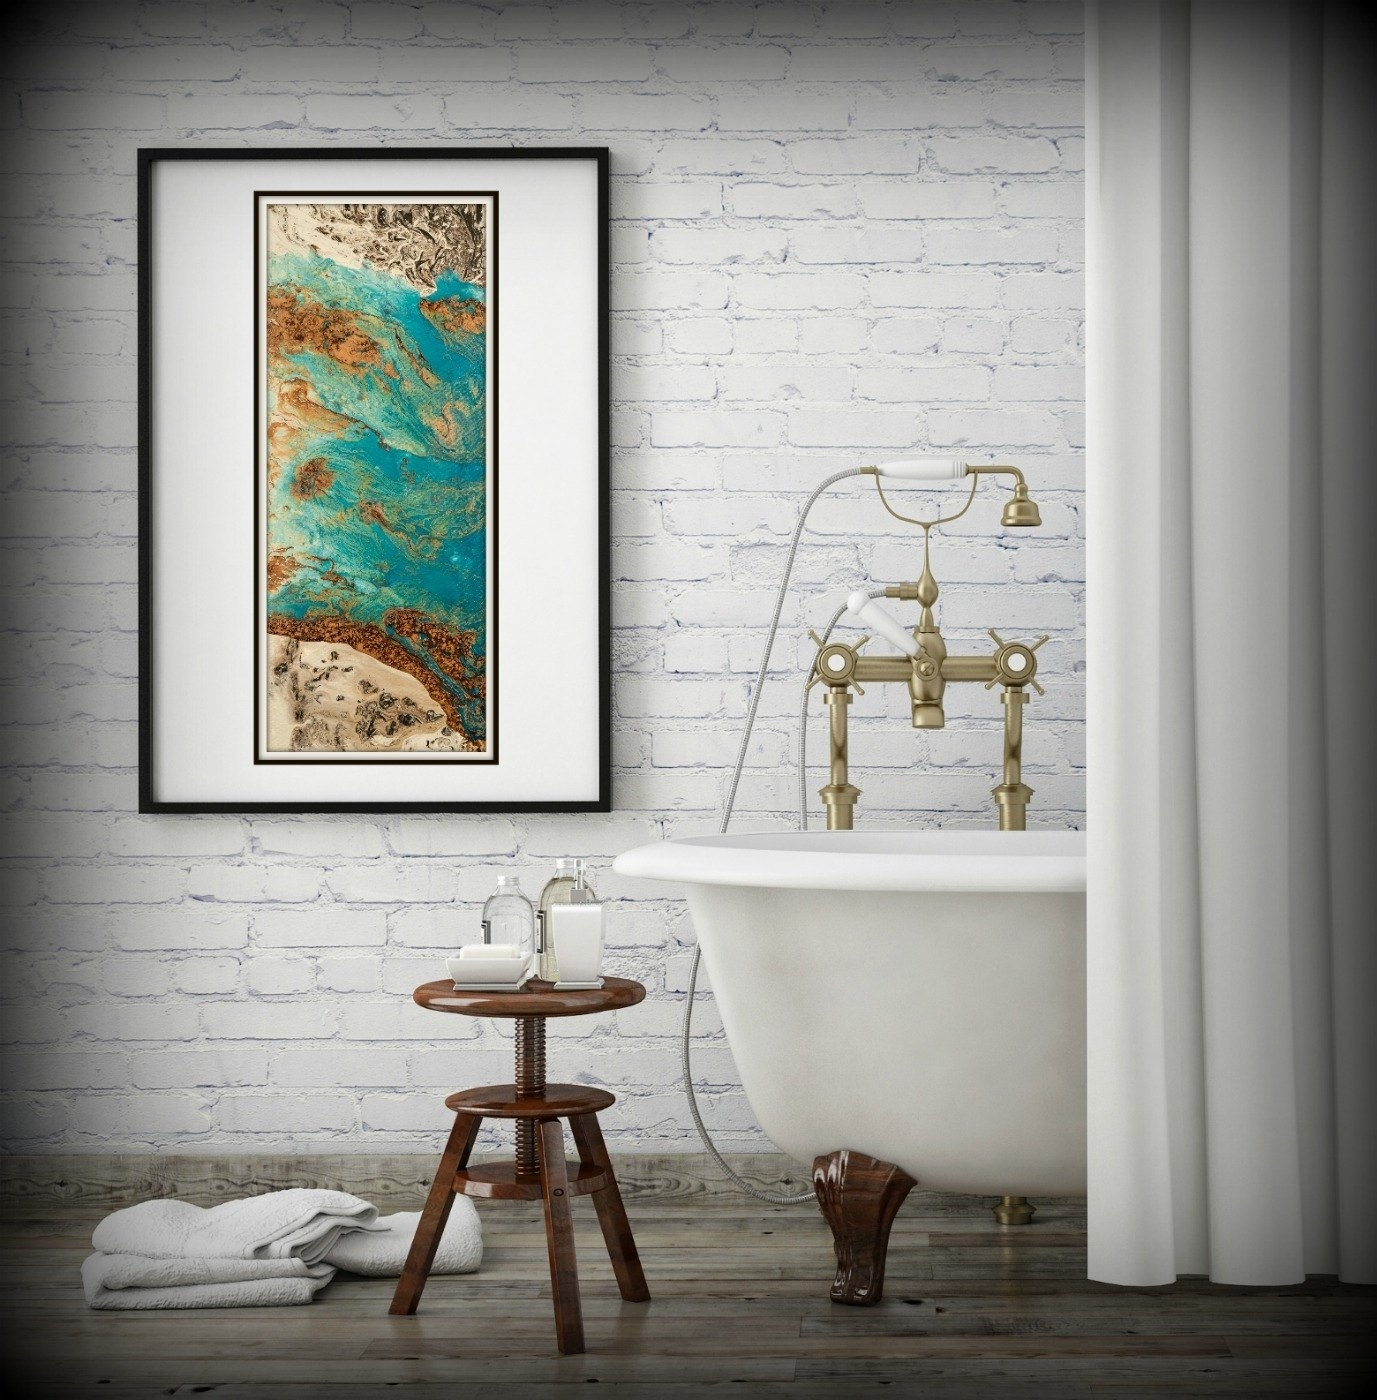 Blue And Copper Art, Vertical Wall Art Prints Fine Art Prints Regarding Most Recent Vertical Wall Art (View 7 of 20)